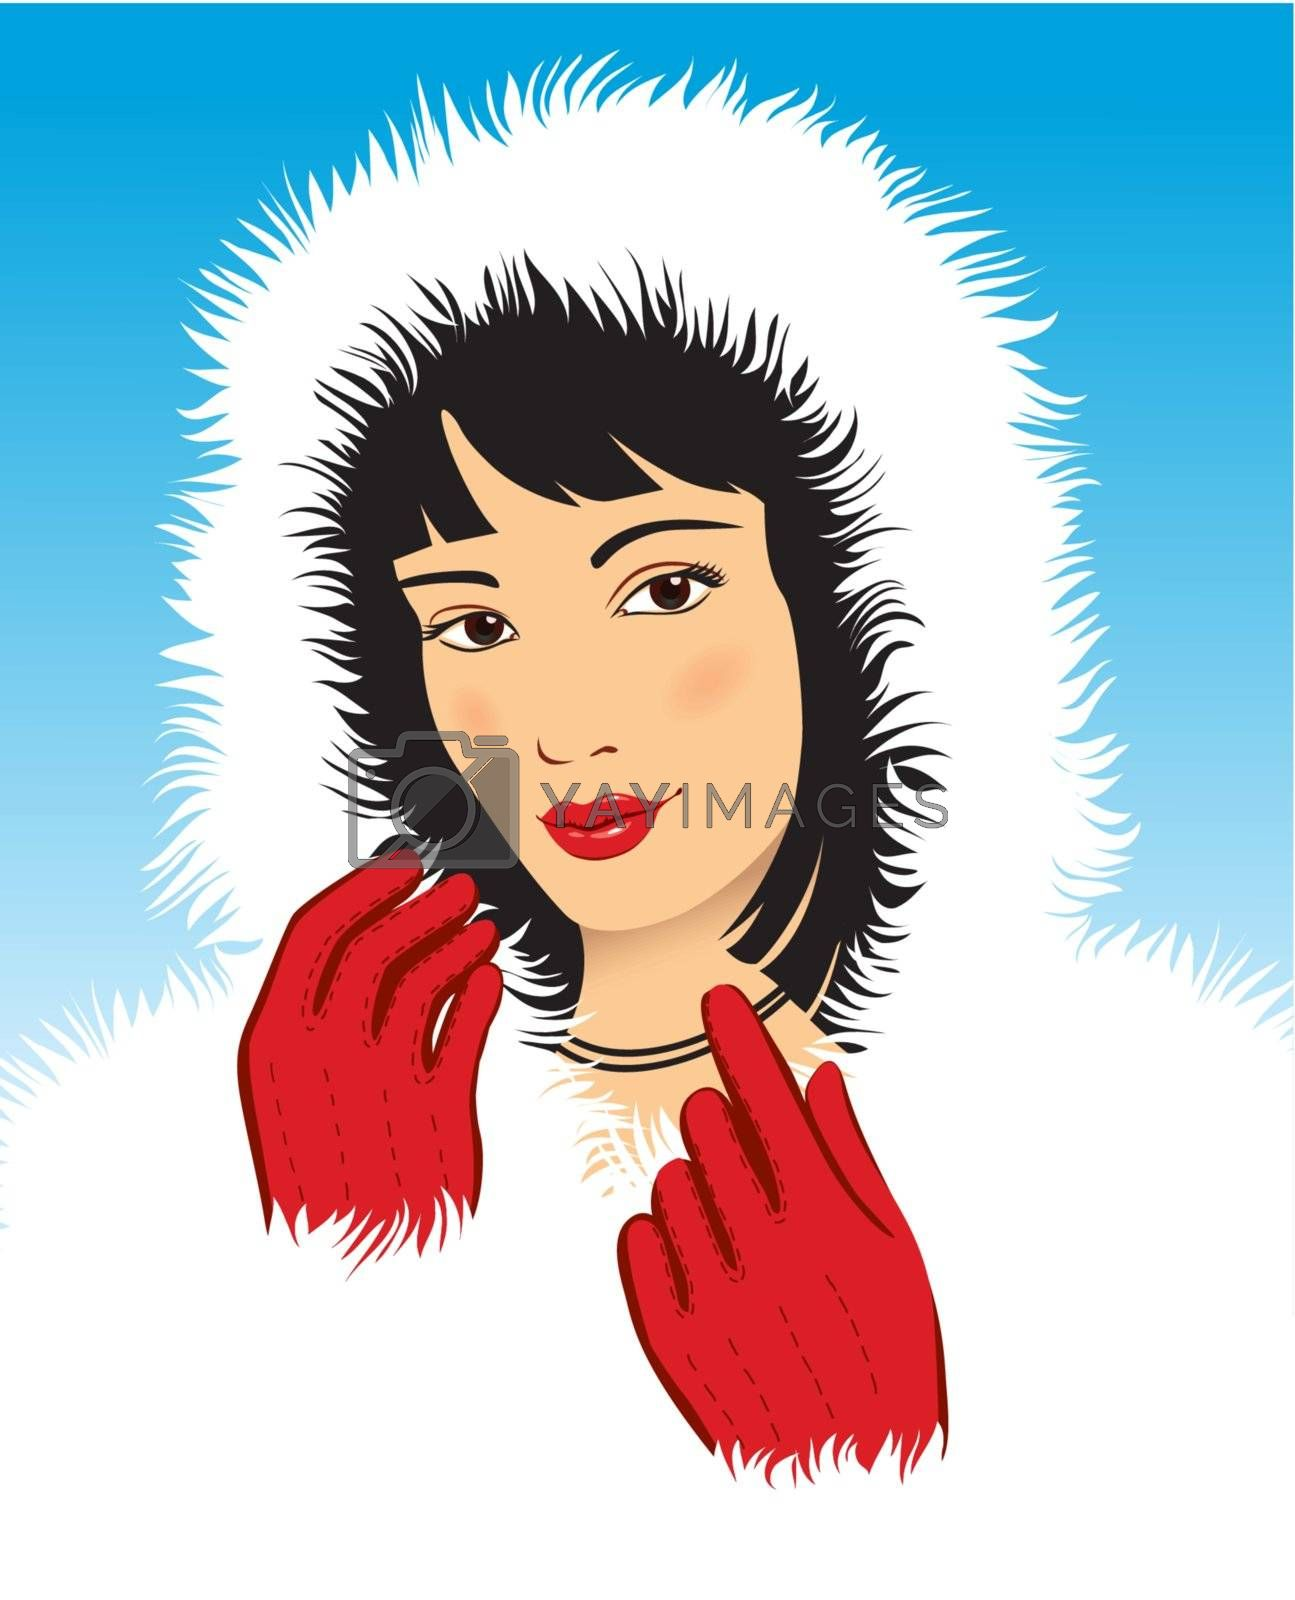 Young beautiful women dressed in fur coat